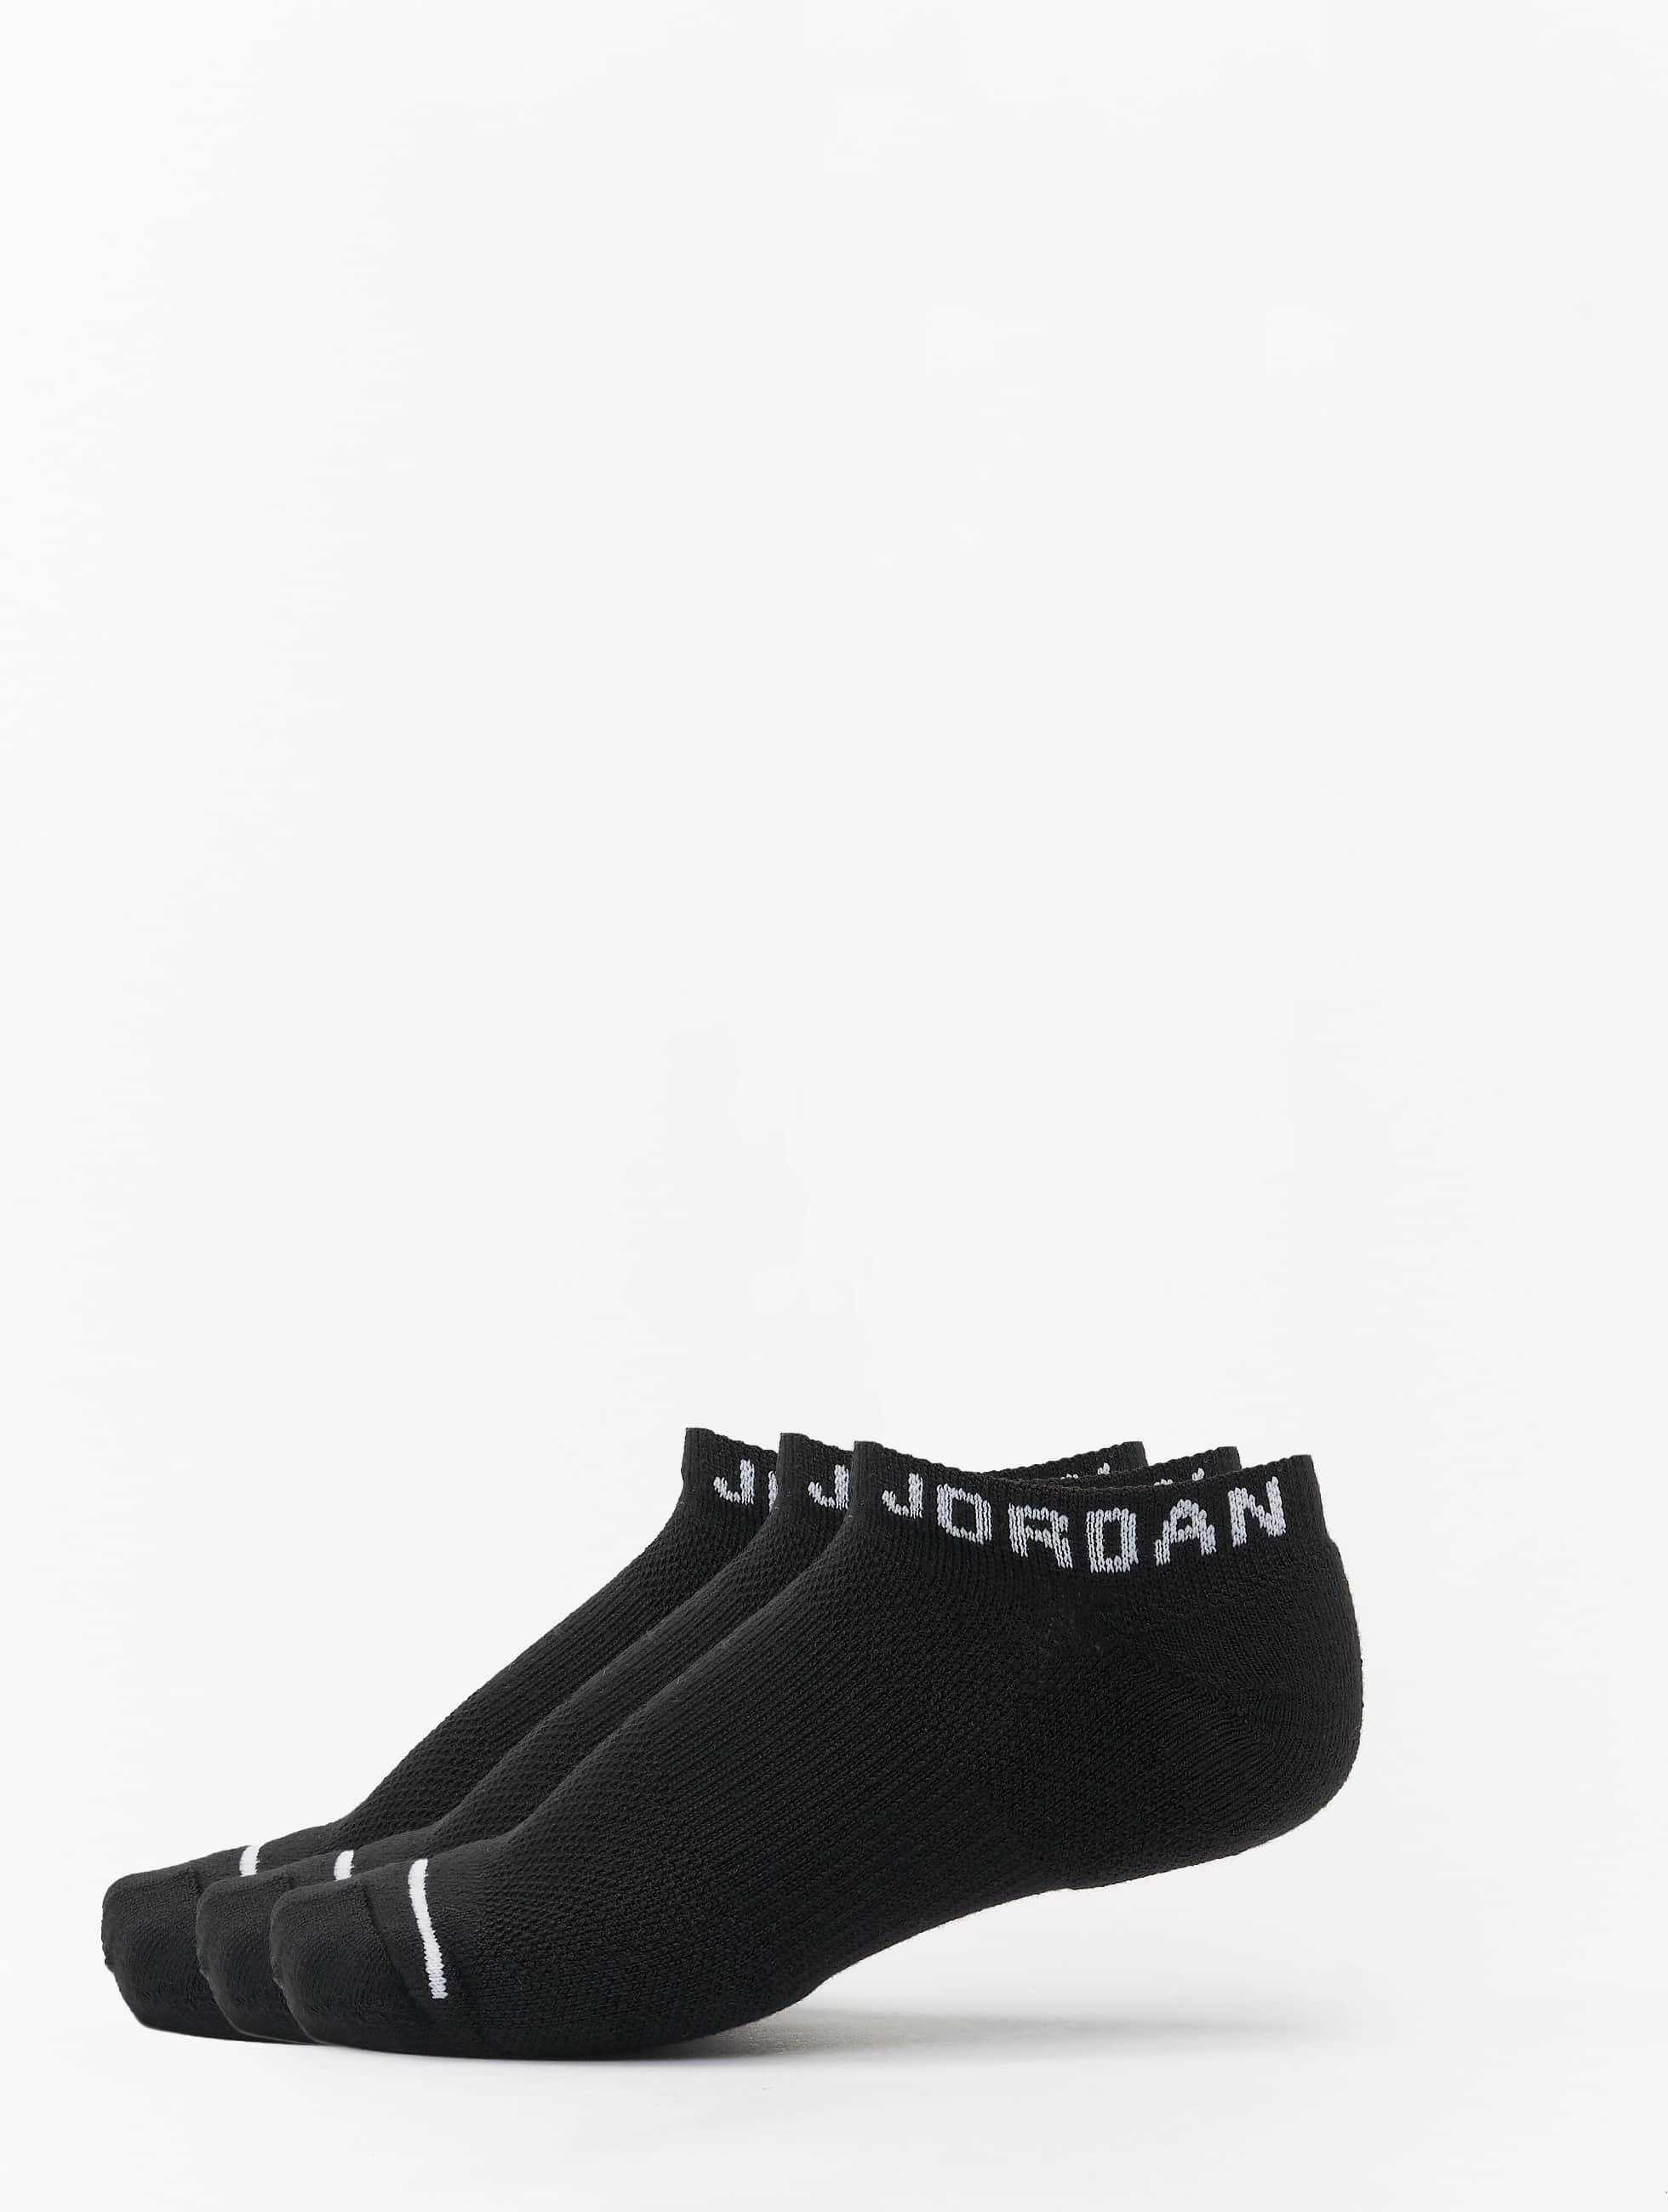 Jordan Männer,Frauen Socken Jumpman No Show in schwarz